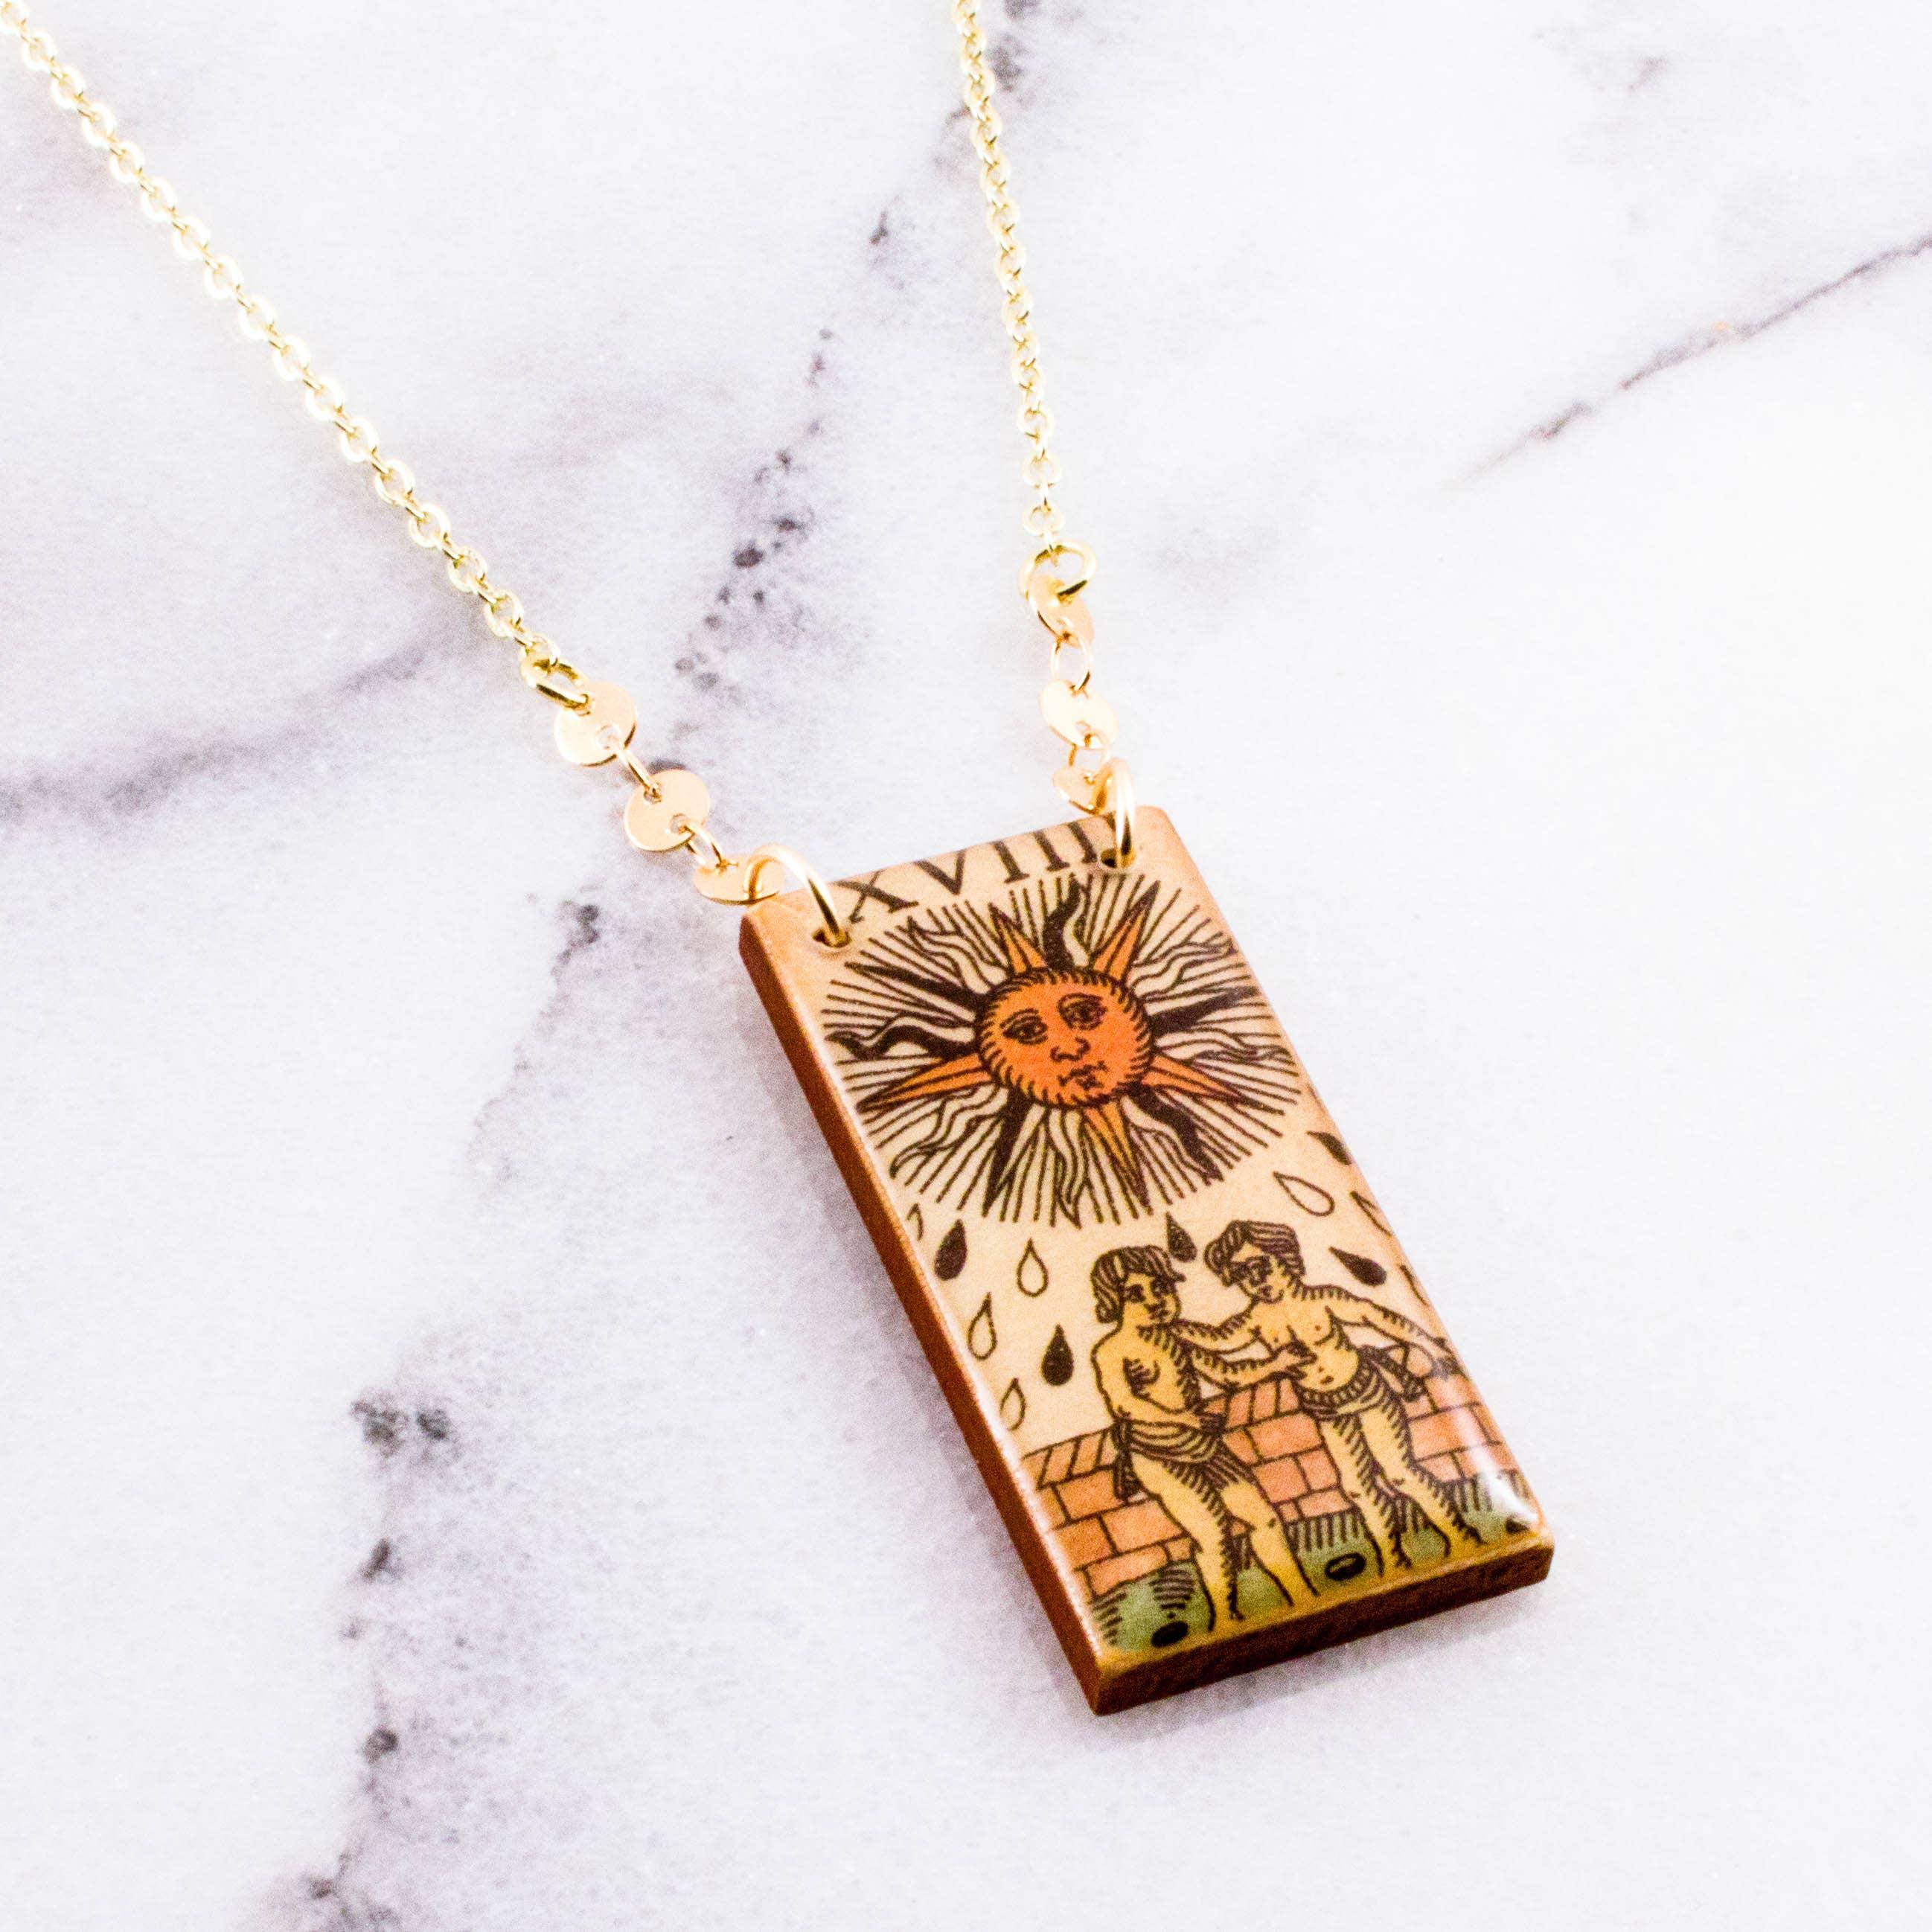 Vintage Italian Tarot Sun Necklace   Trada Marketplace